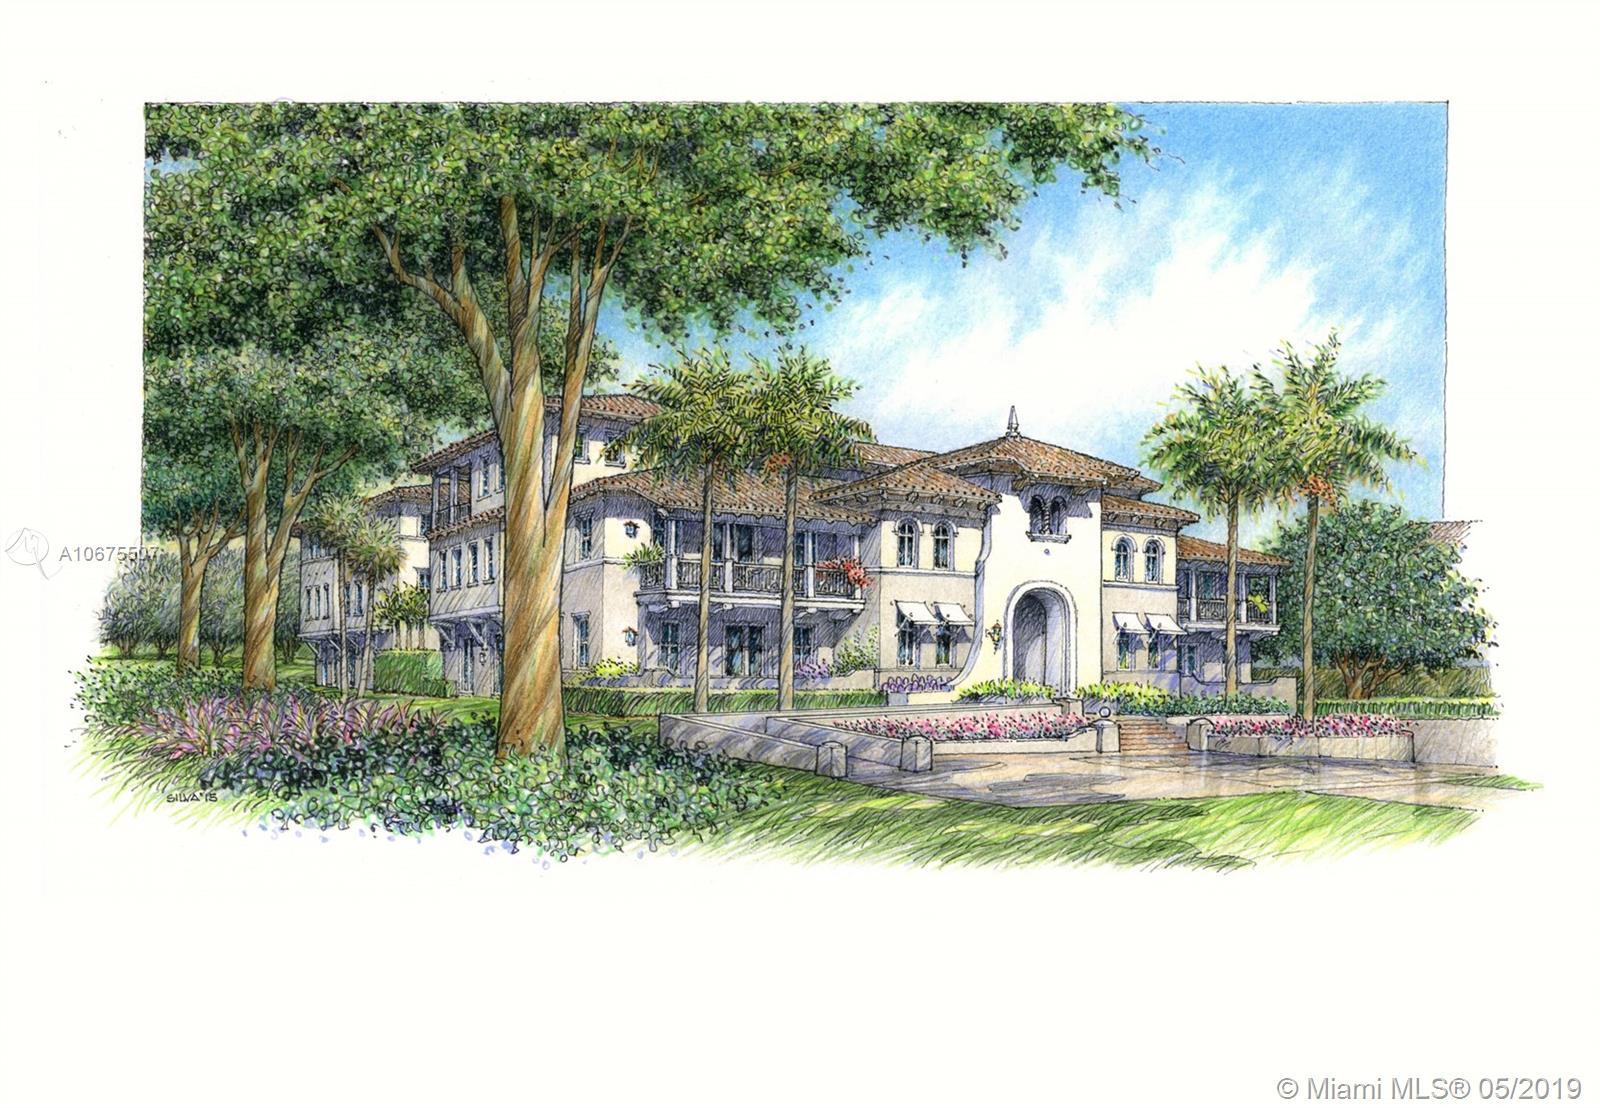 1228 Anastasia Ave 203, Coral Gables, FL 33134